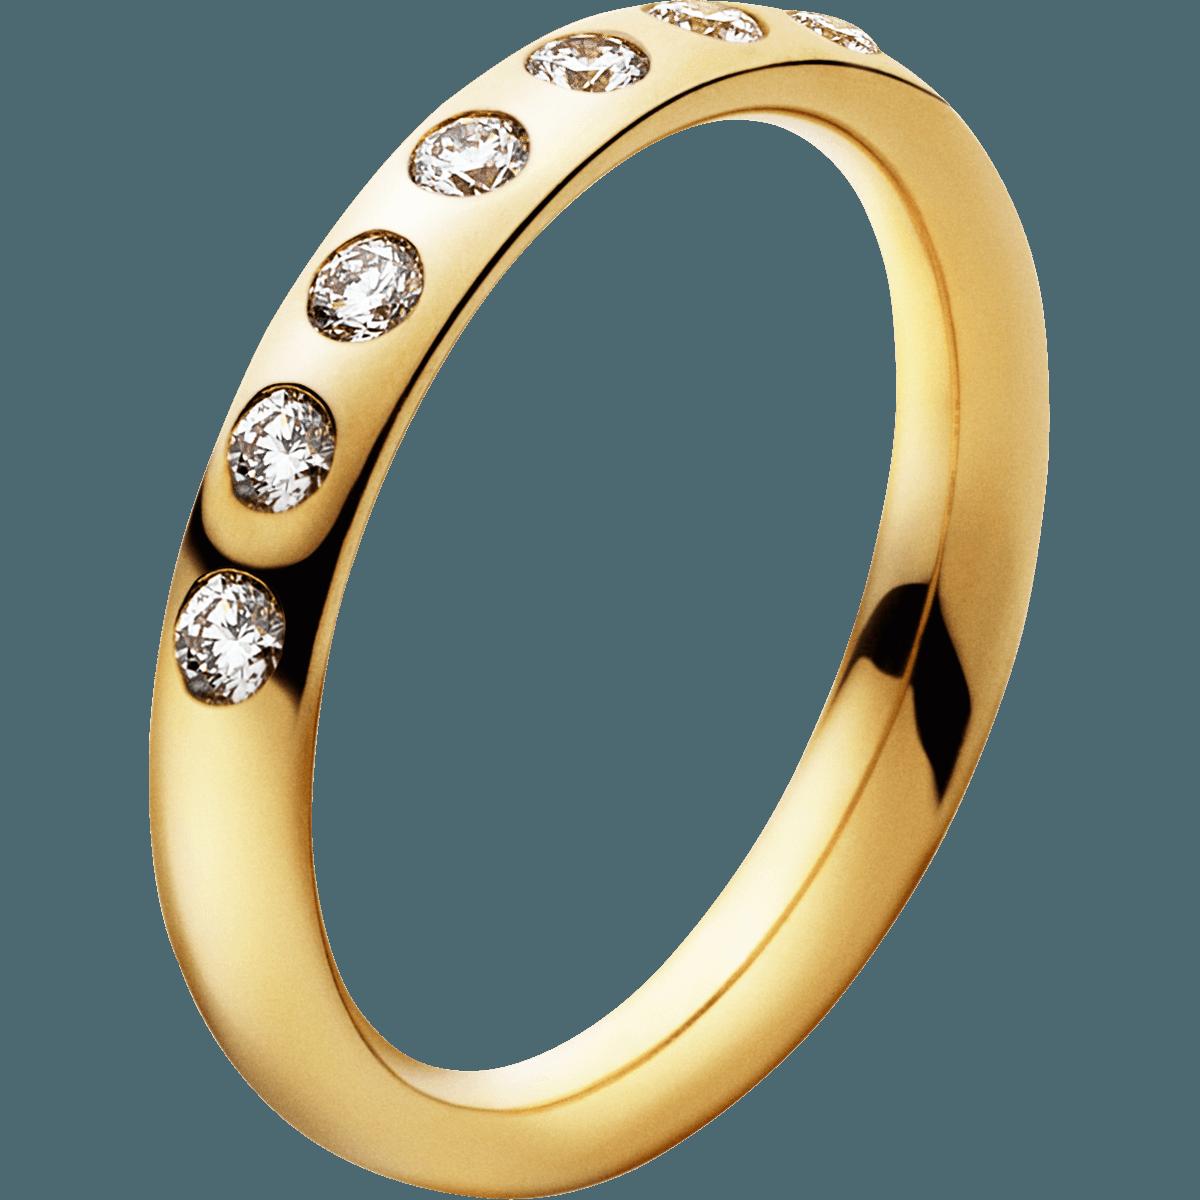 Download Gold Ring Png HQ PNG Image | FreePNGImg